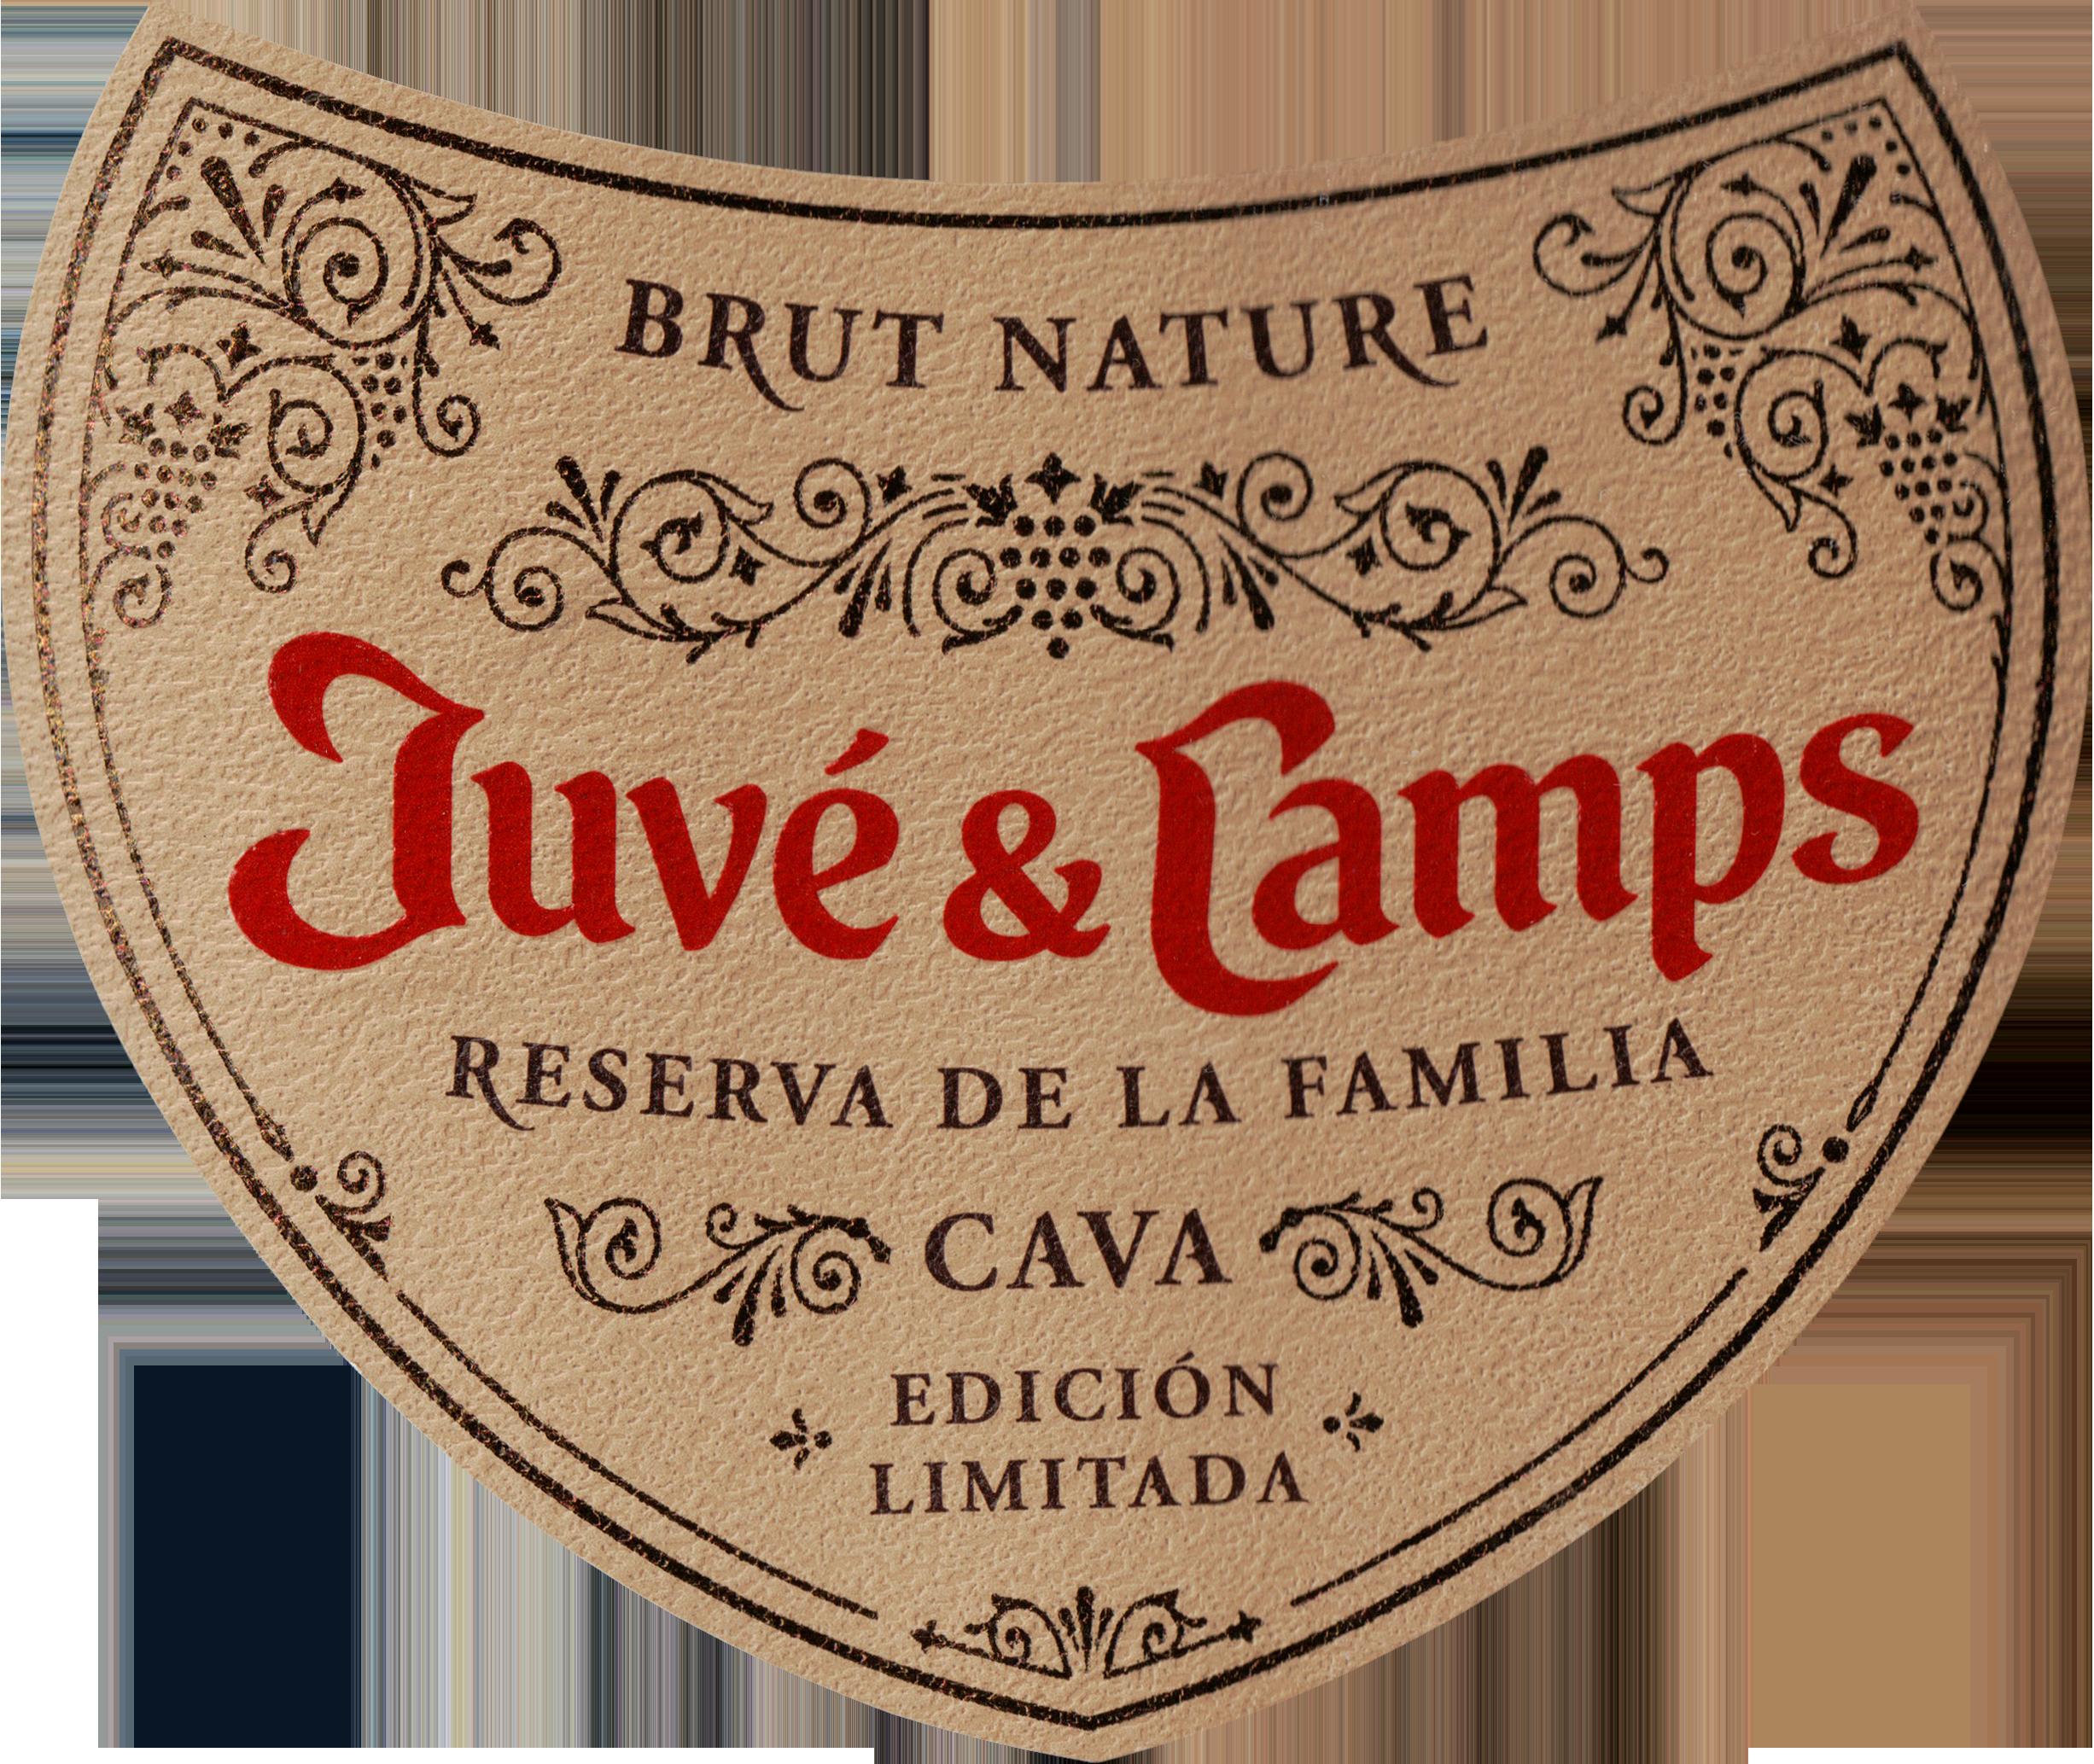 Juve Y Camps Reserva Famillia Brut Nature 40th Anniversary